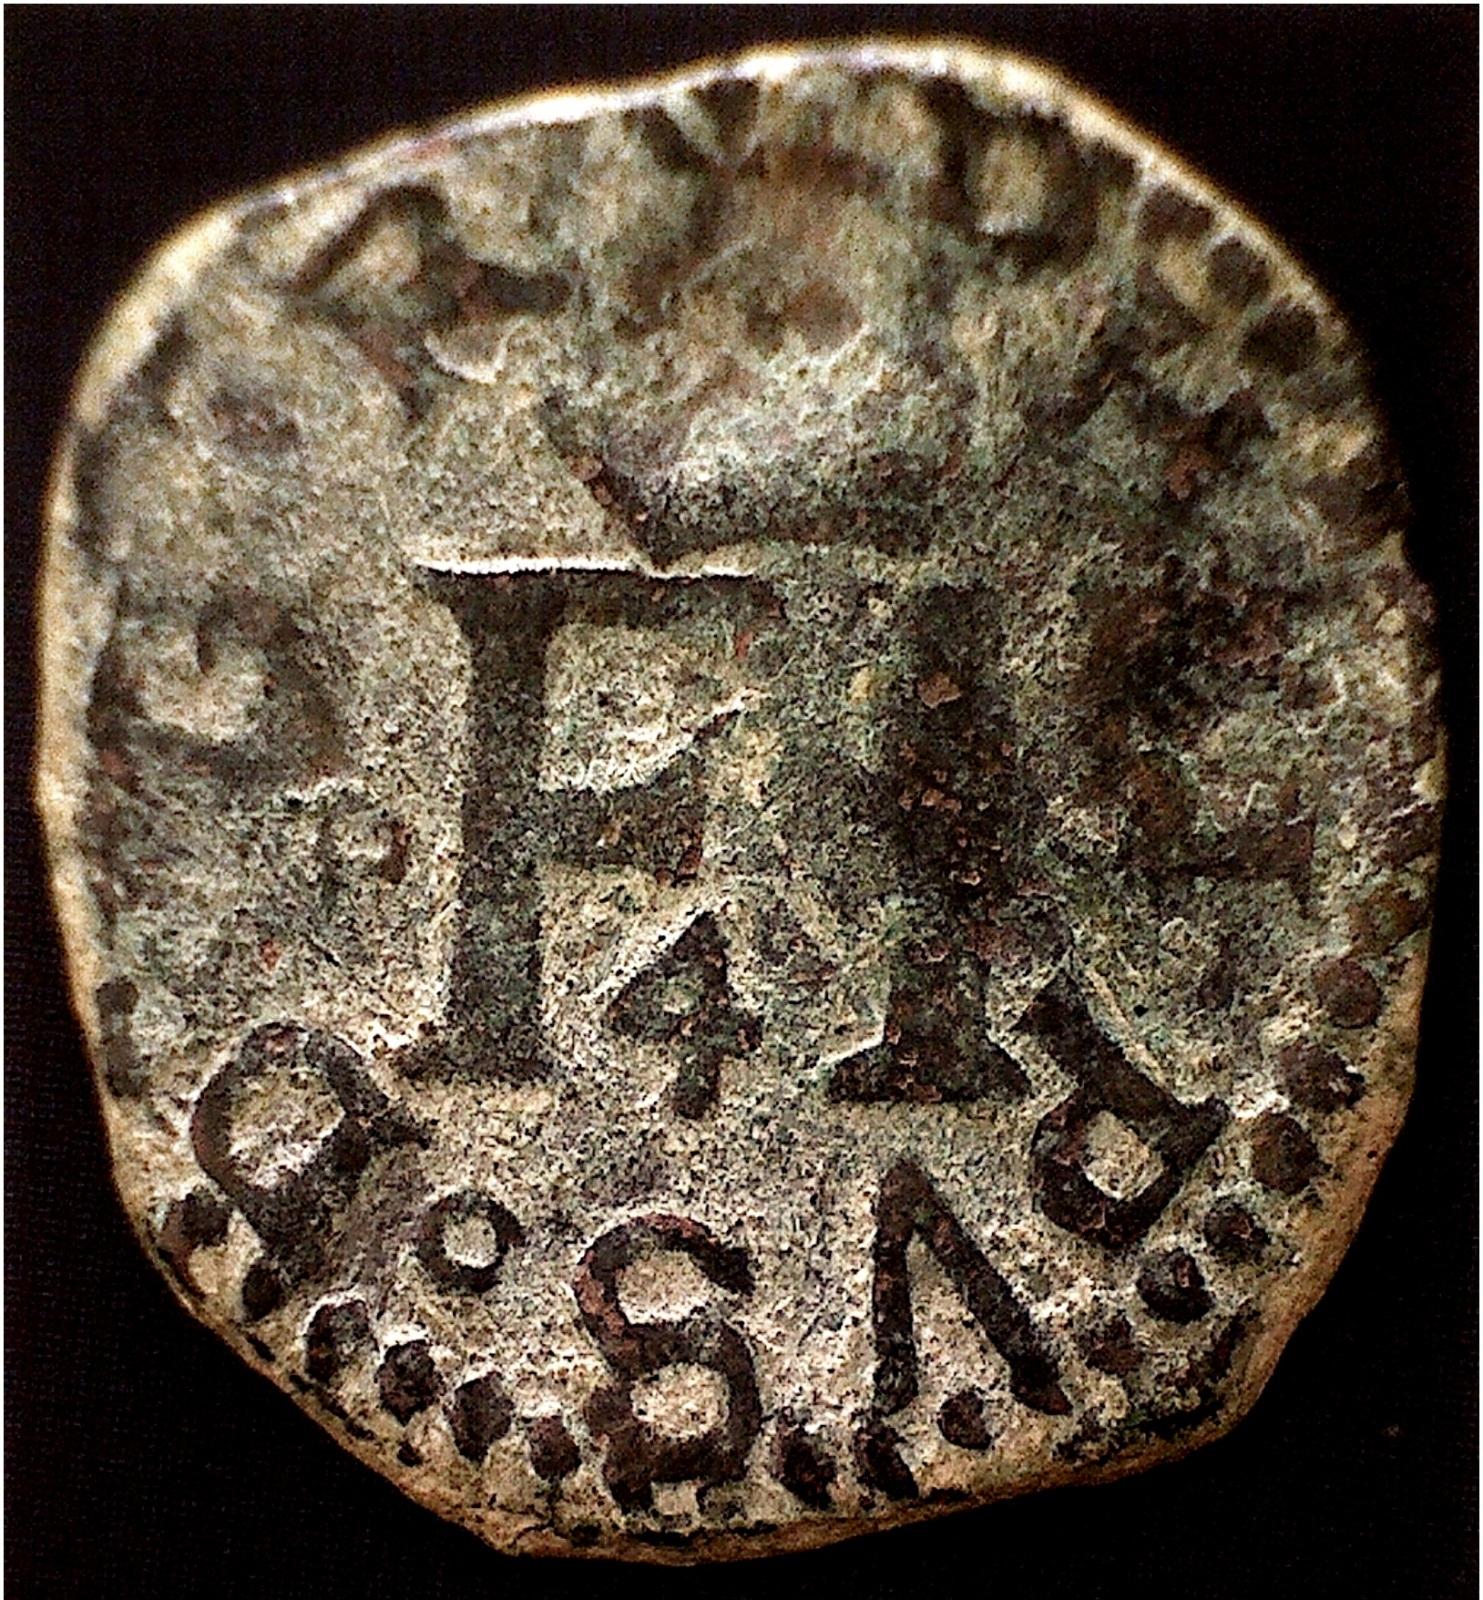 4 Cornados a nombre de Felipe II ( IV de Navarra ), Pamplona, 1574 - 1598. Ng7mfd